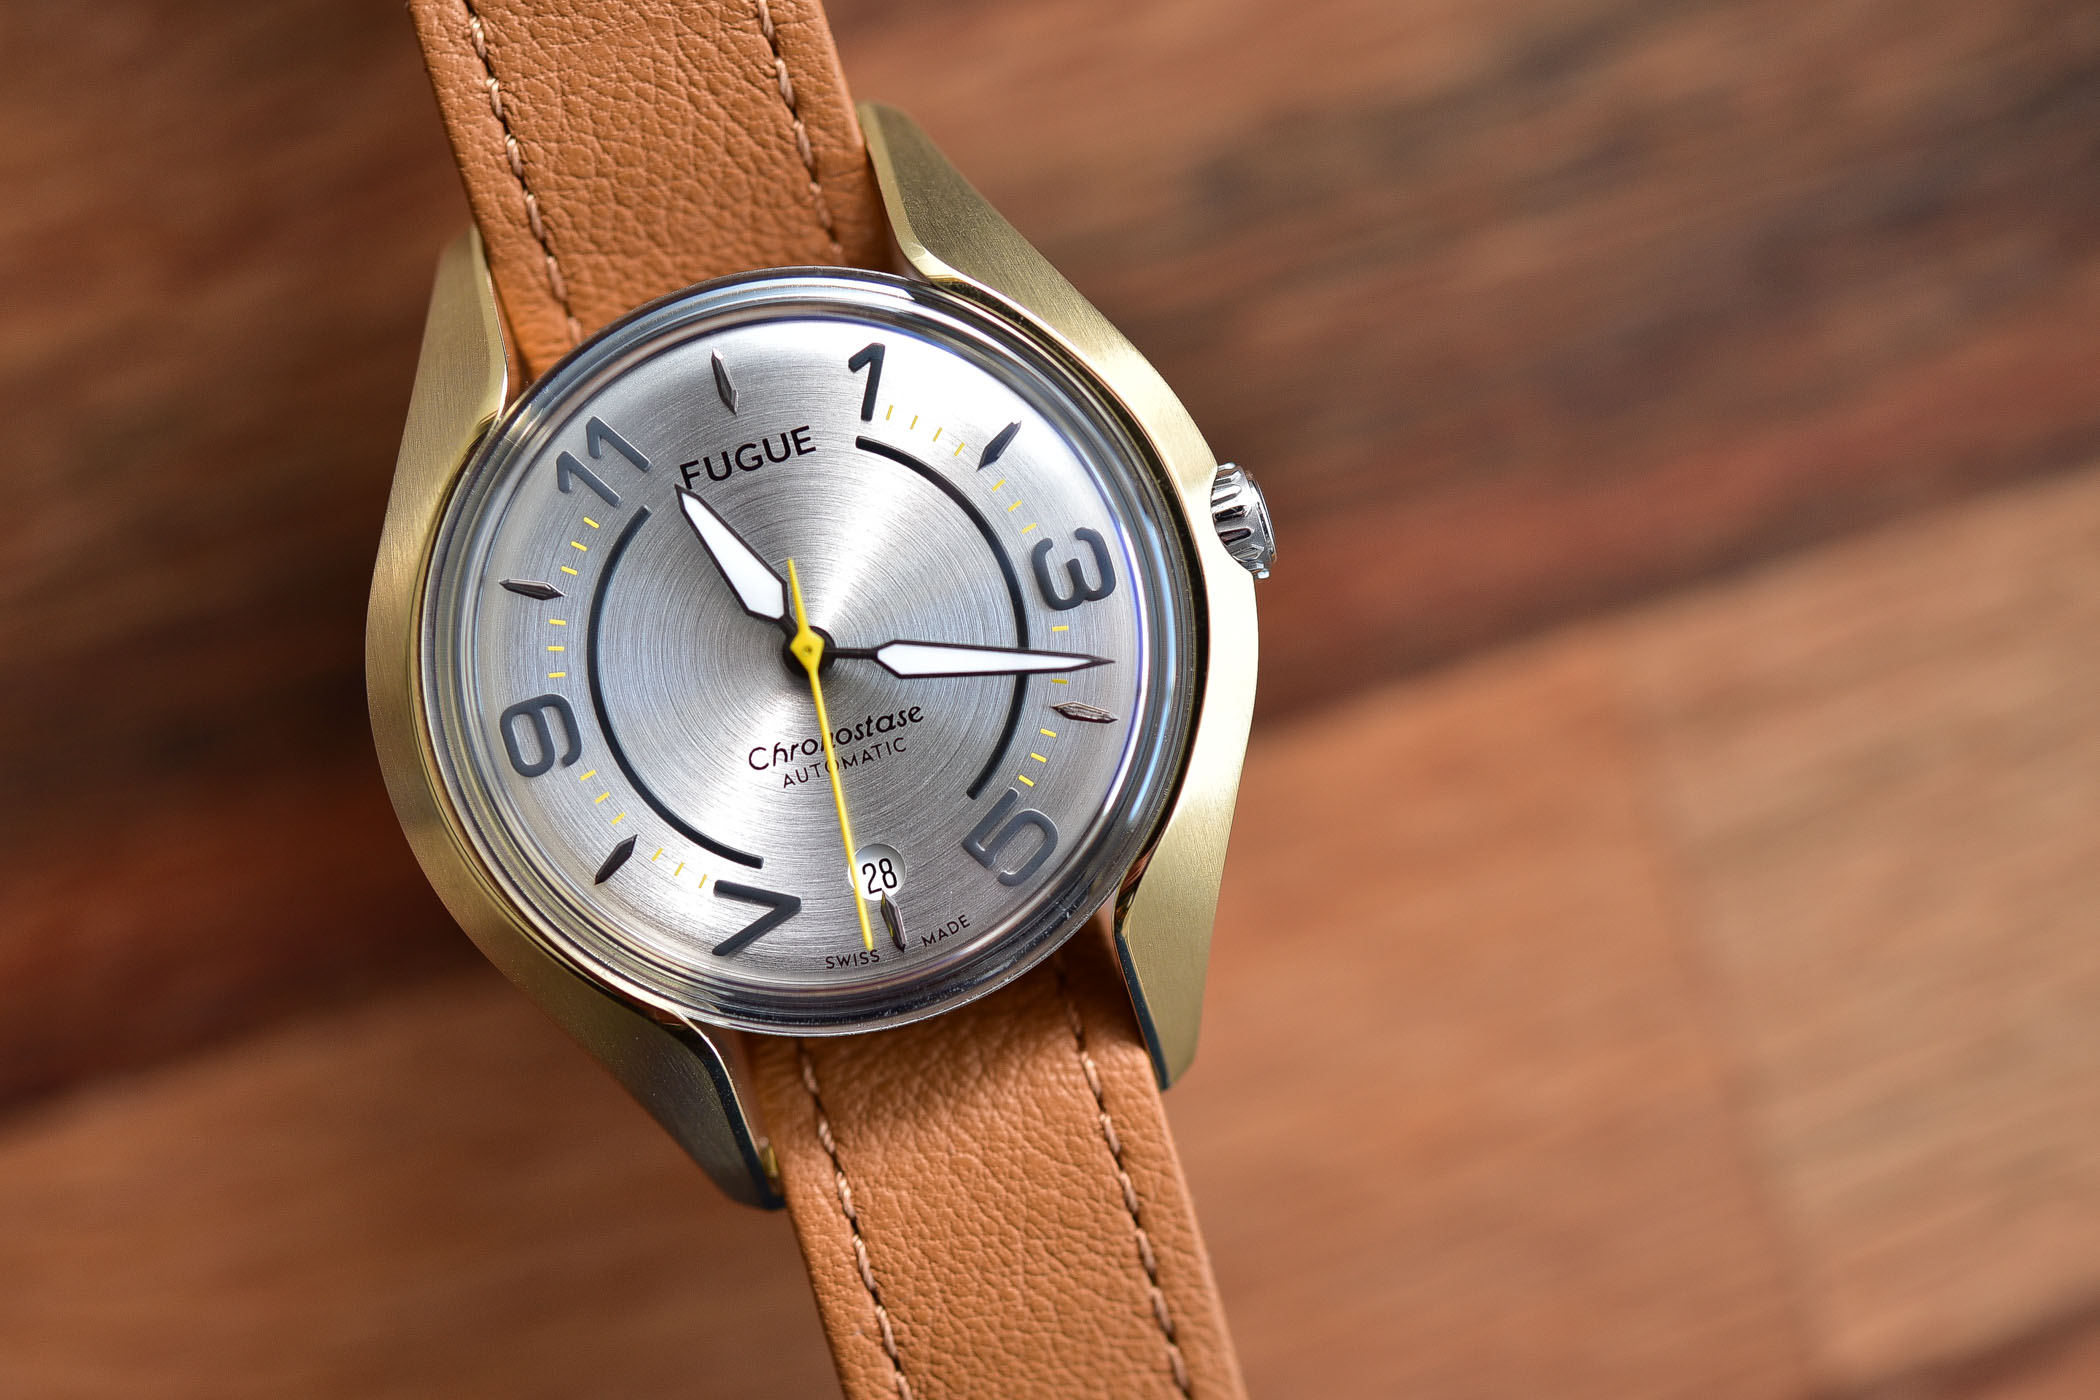 Fugue Watch Chronostase modular watch interchangeable case and strap - 5